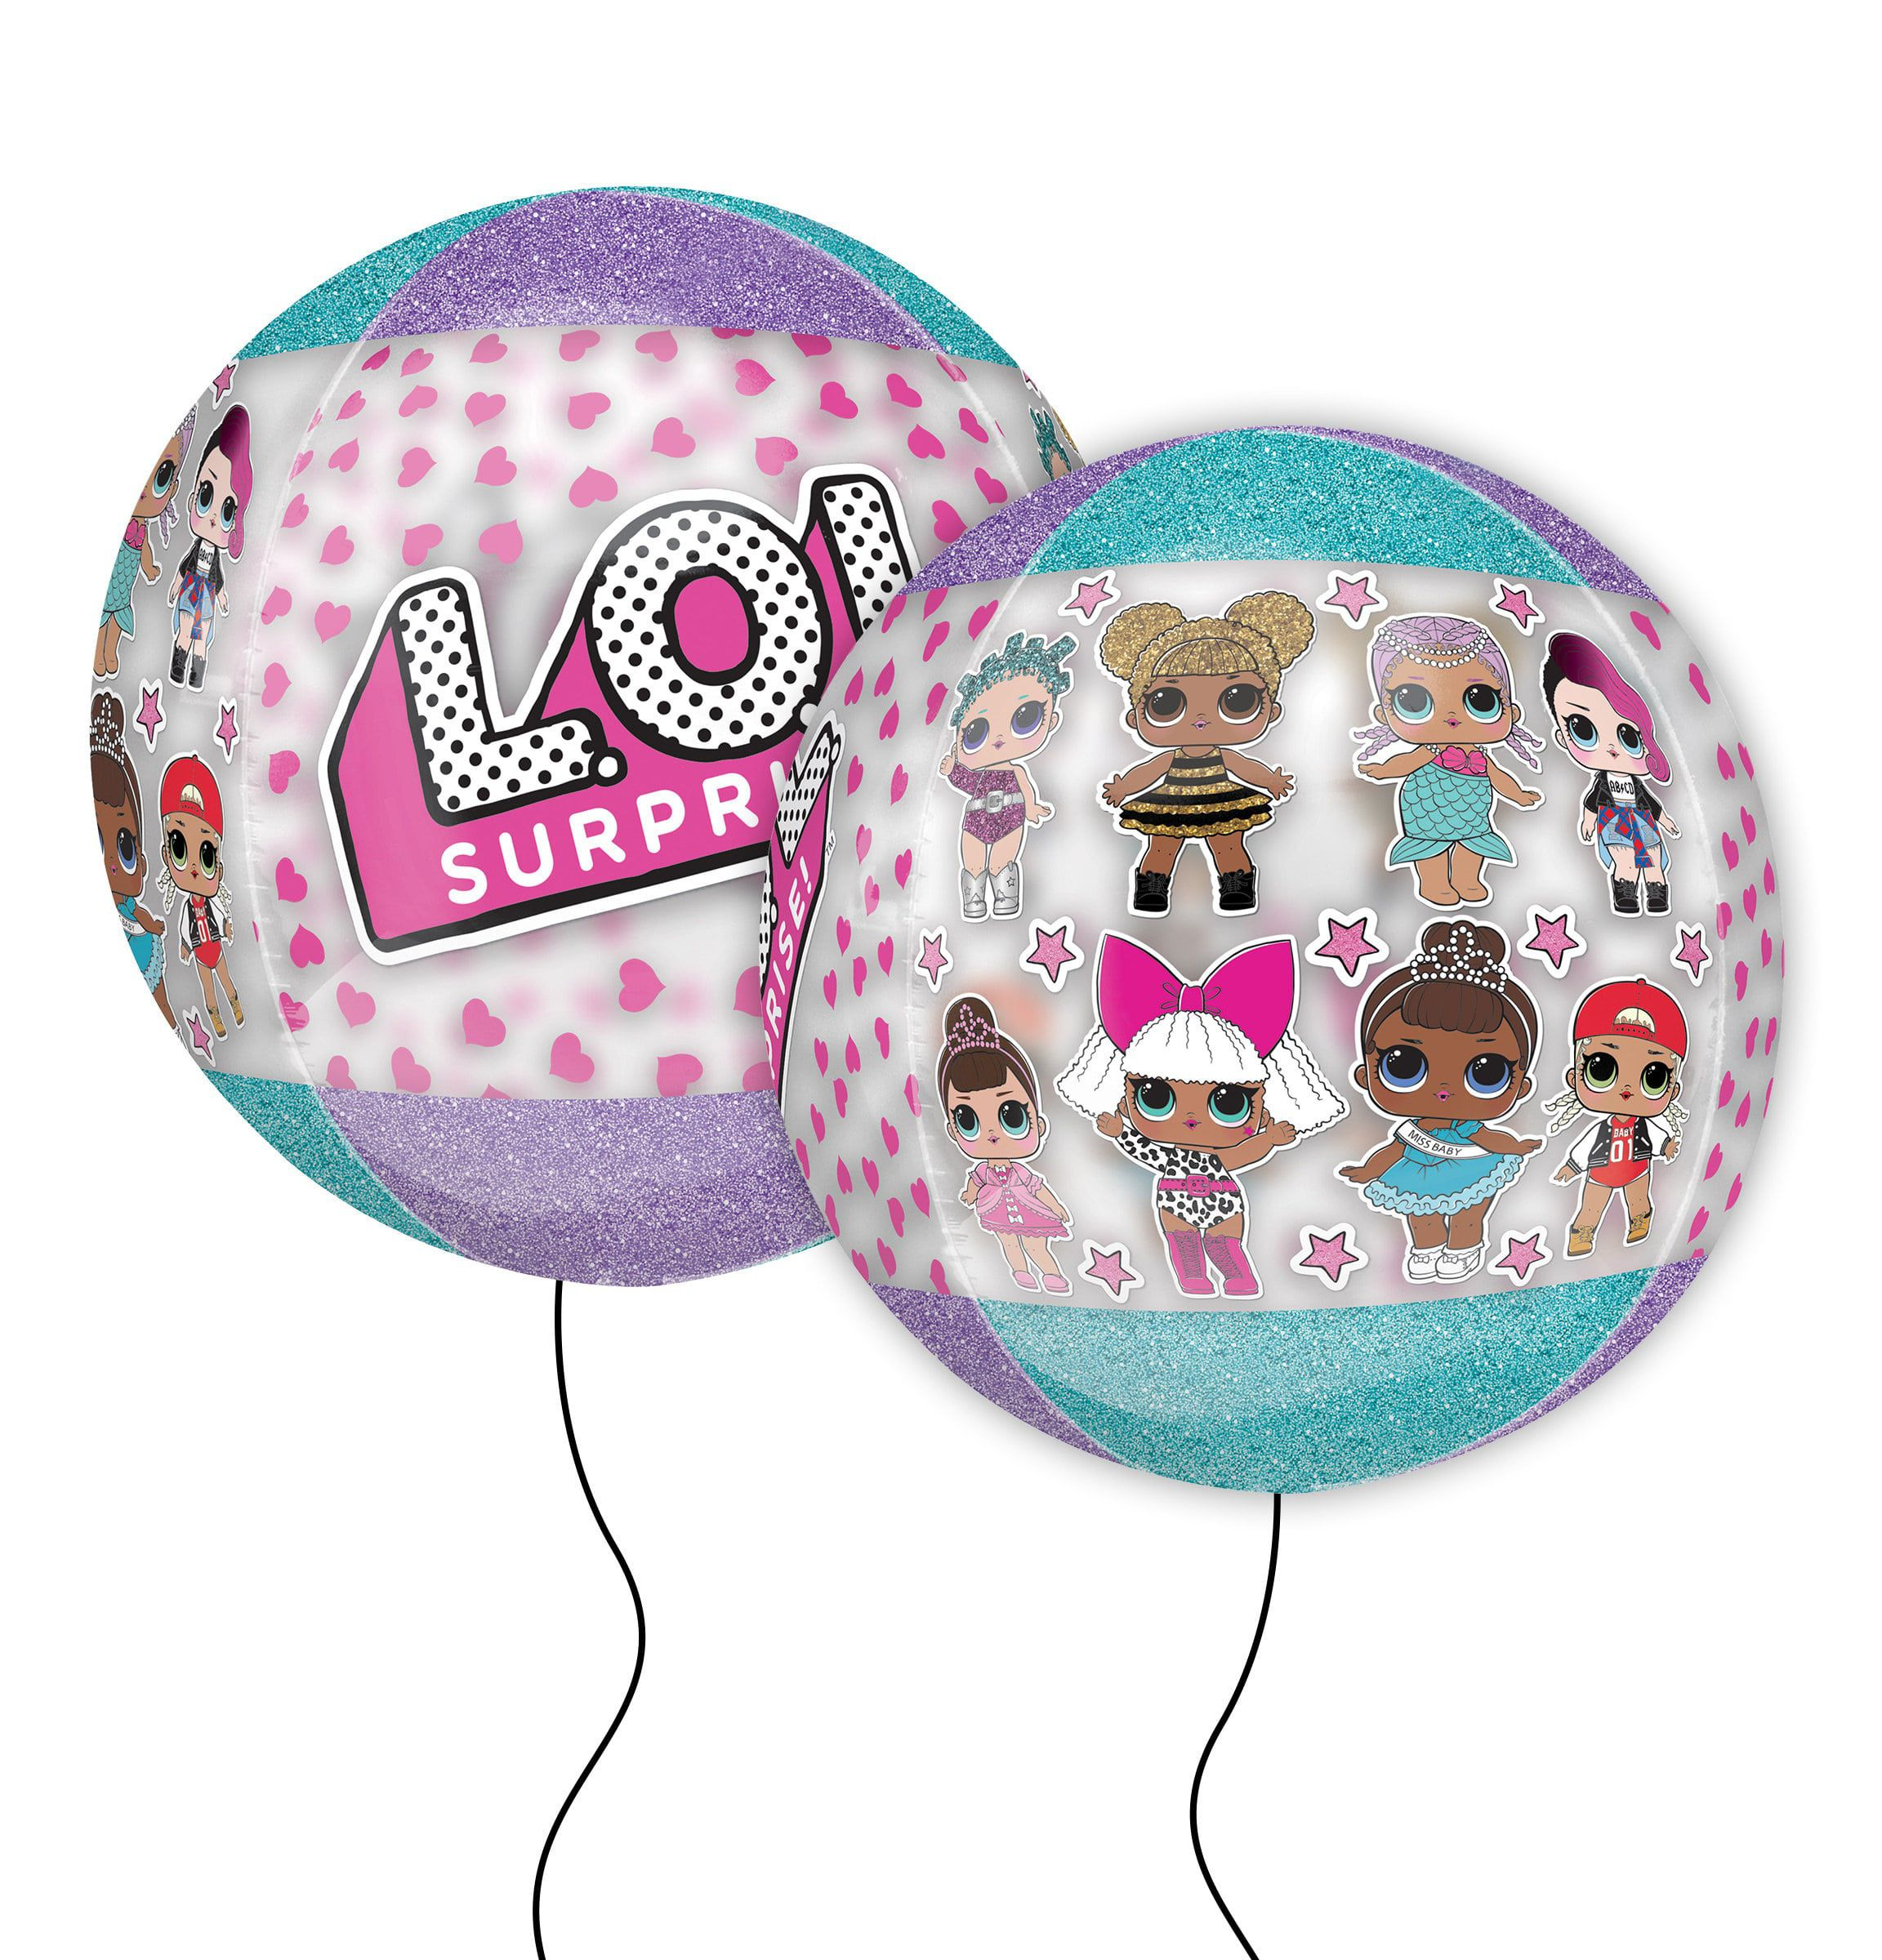 16 Quot Lol Surprise Orbz Balloon Partybell Com